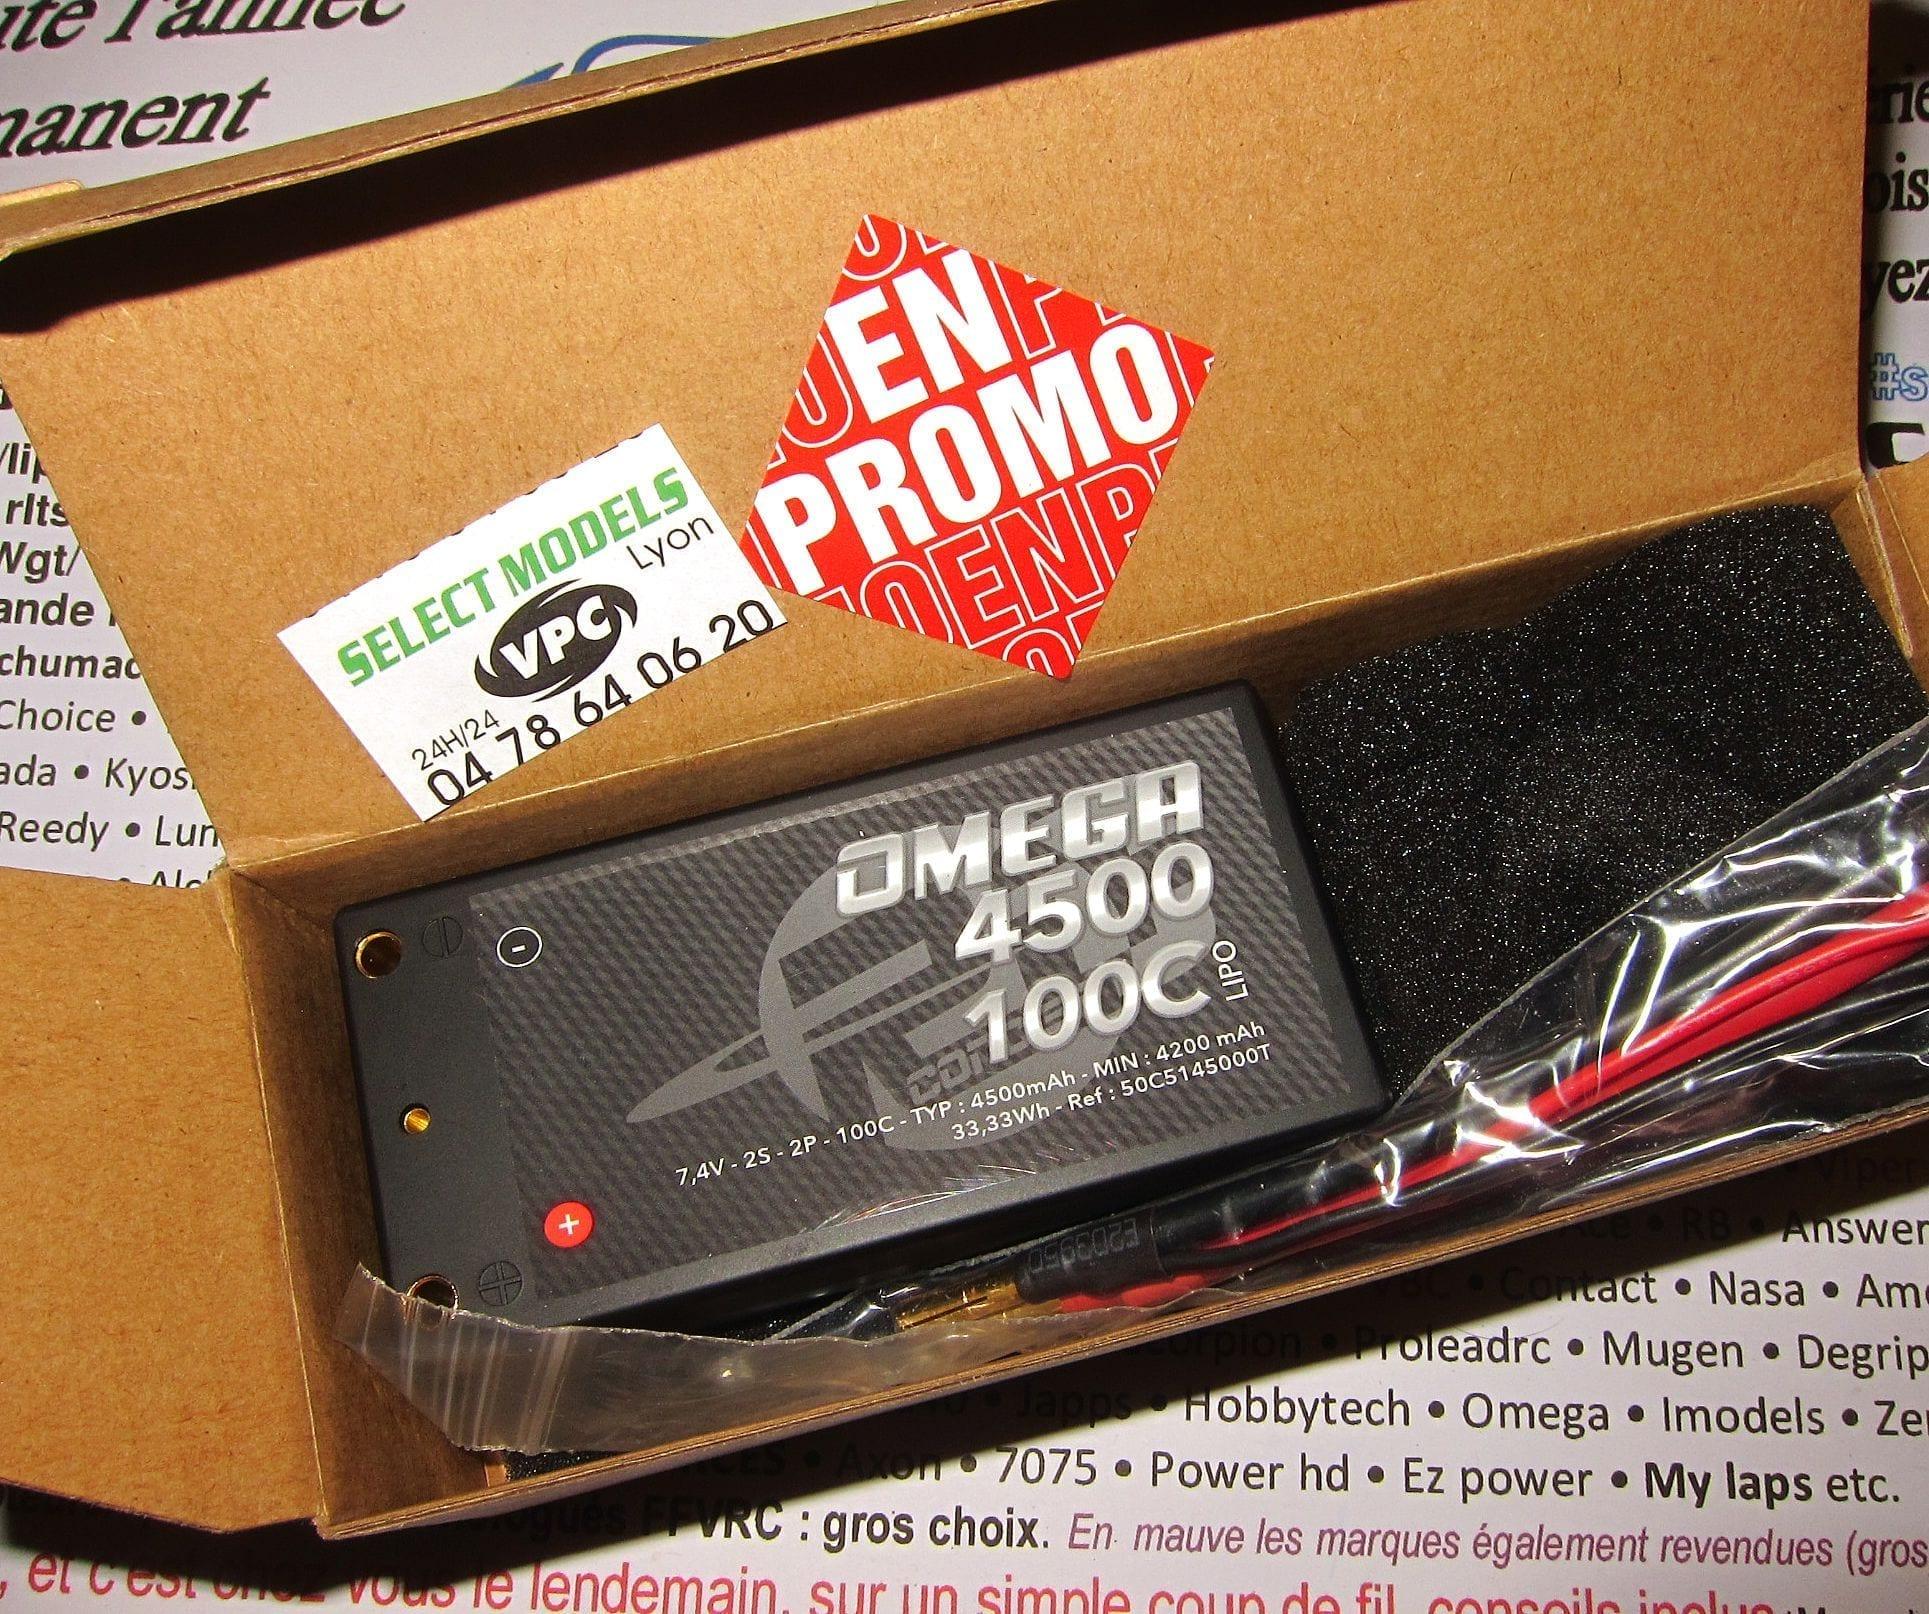 Promo Omega Rc concept Lipo 4500 shorty 100C